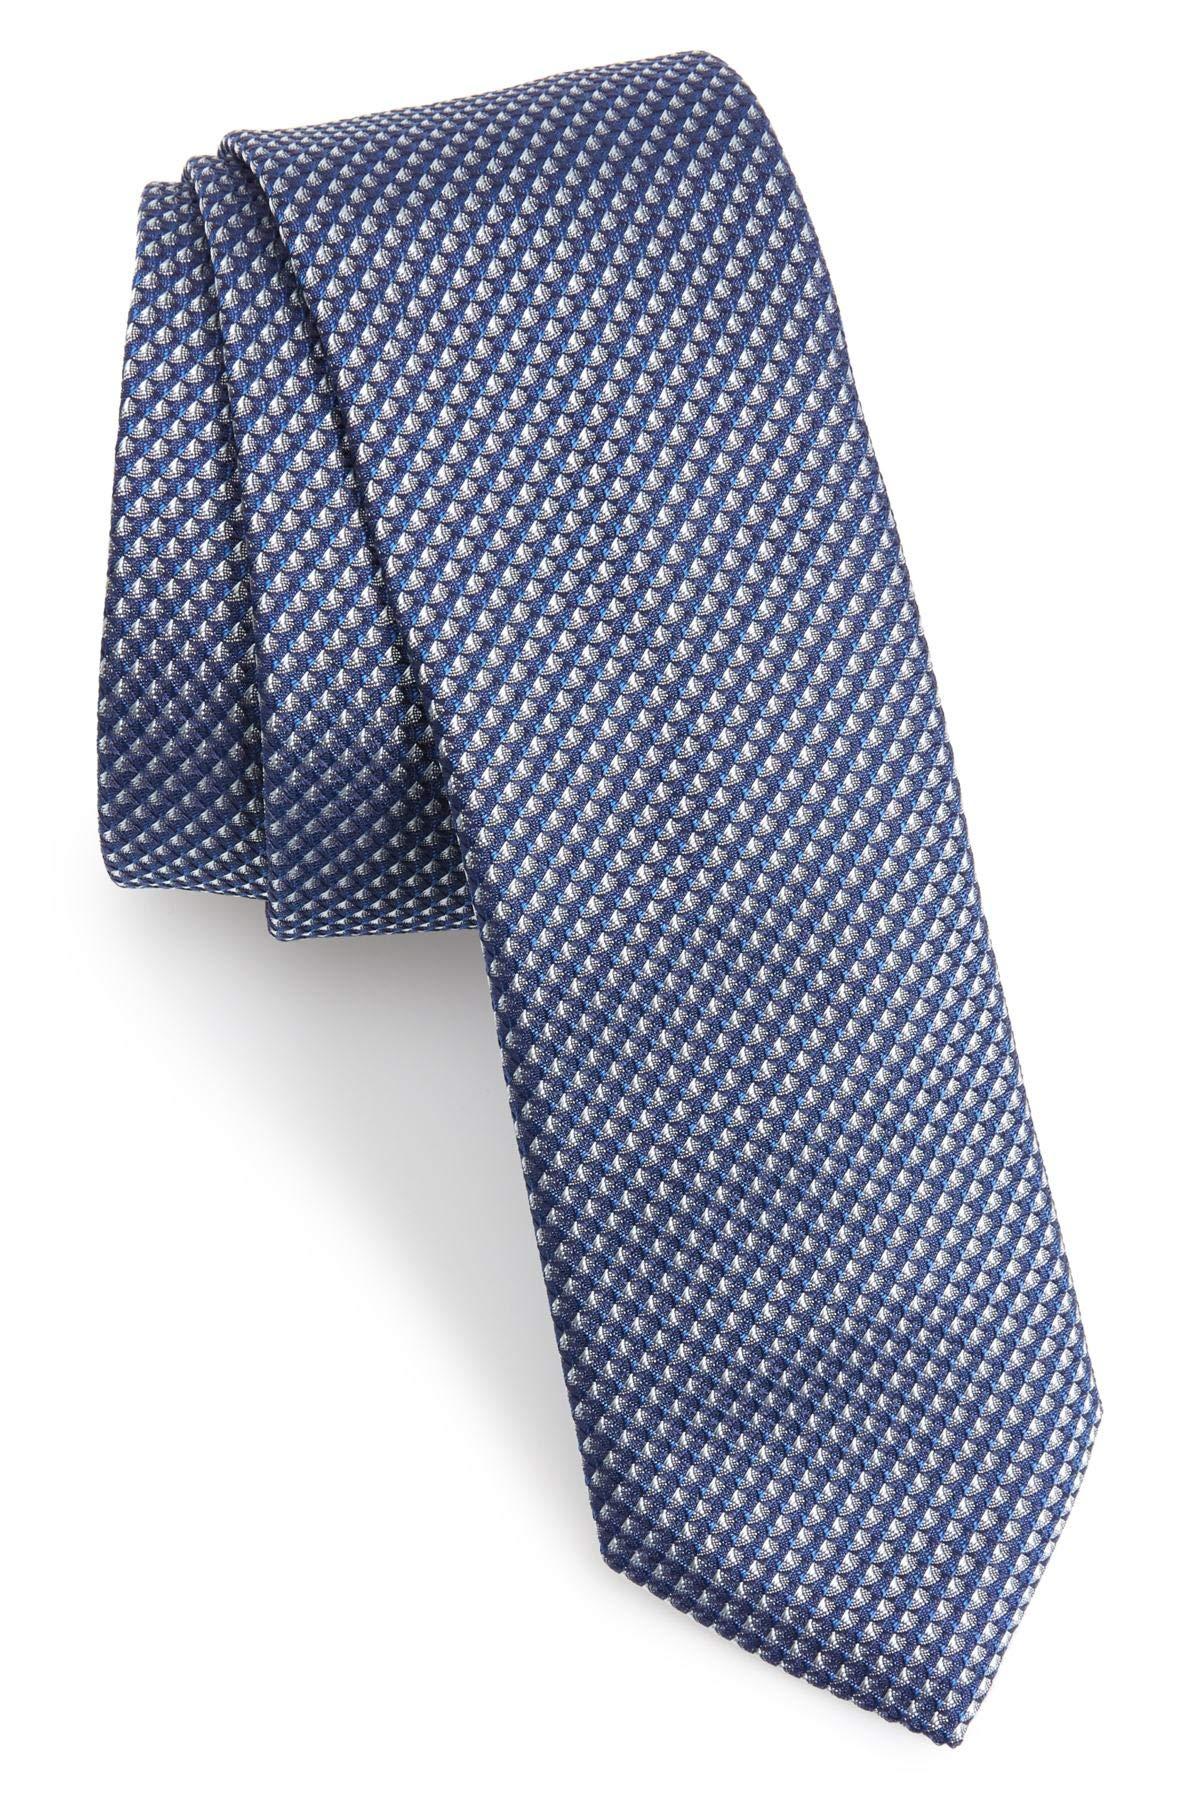 Hugo Boss Textured Slim Woven Italian Silk Tie, Blue 50390133